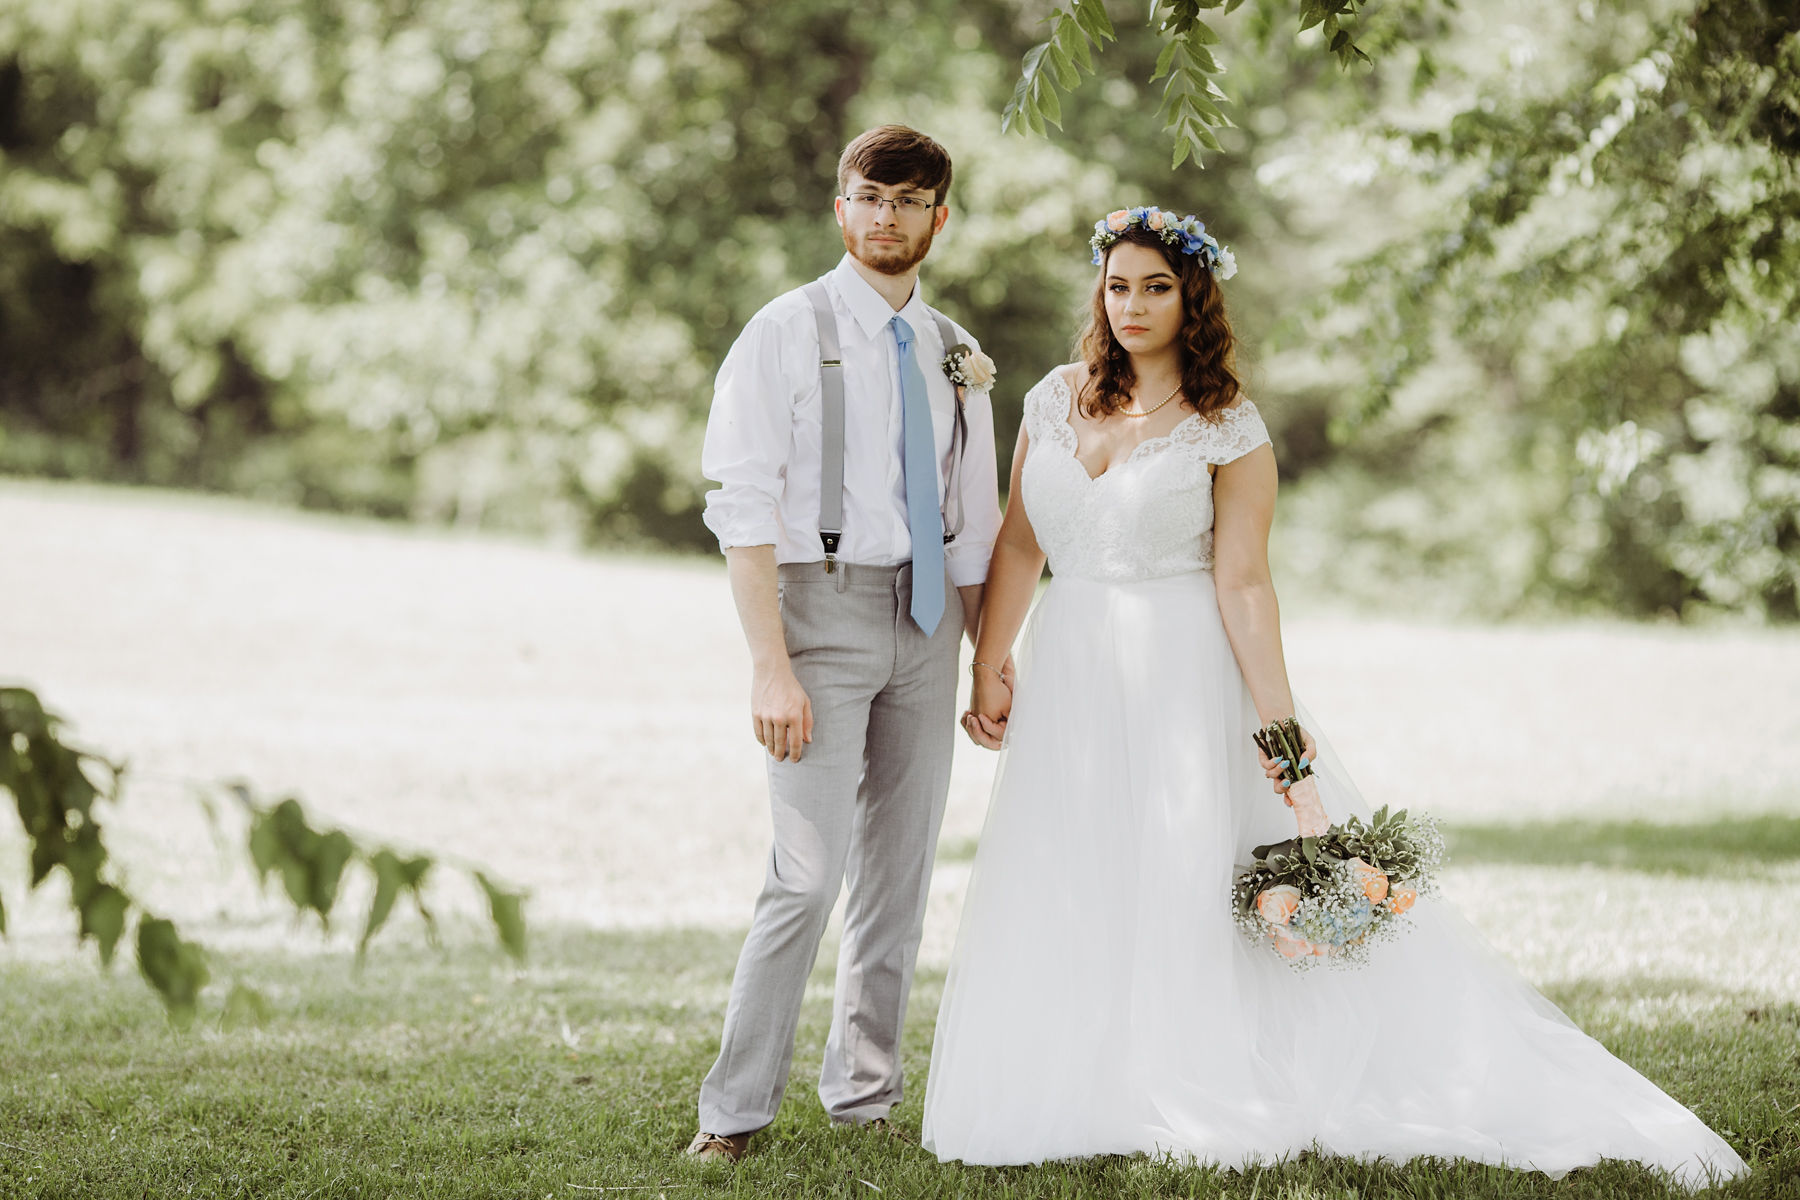 Callie & Todd Prather - July 11, 2018Limitless Portrait Co.